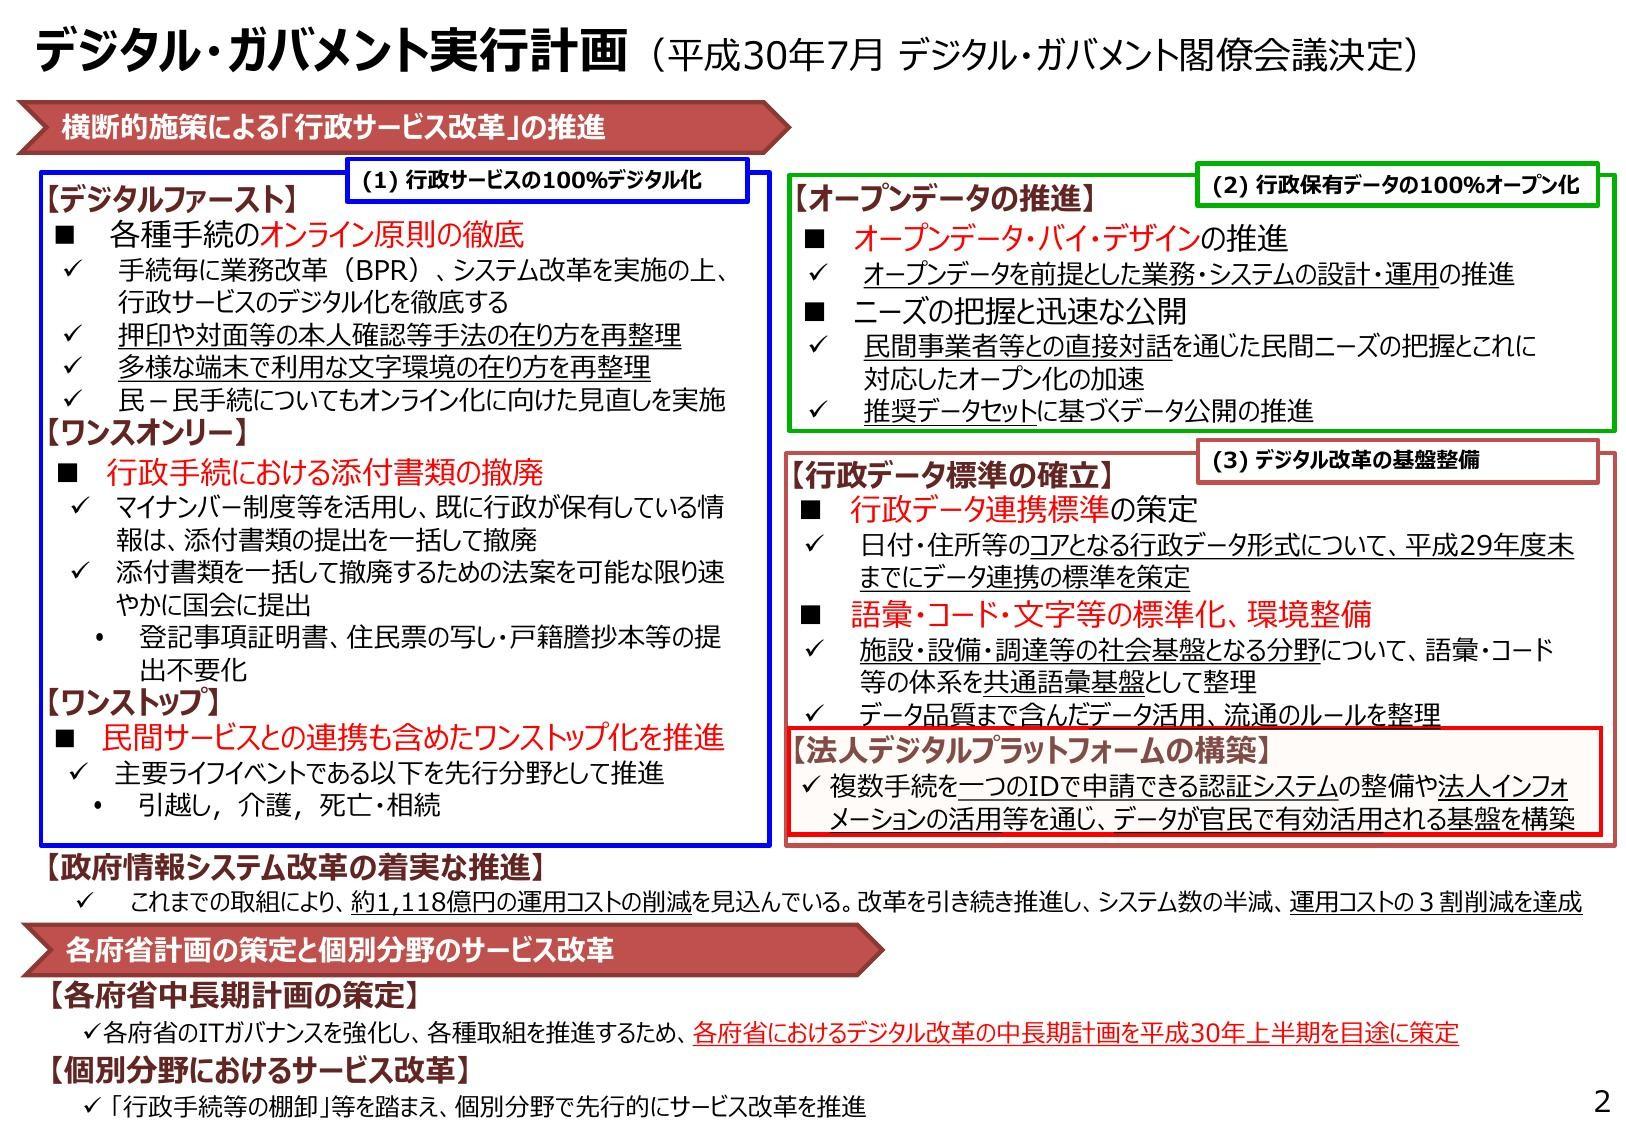 f:id:chayarokurokuro:20210408030401j:plain